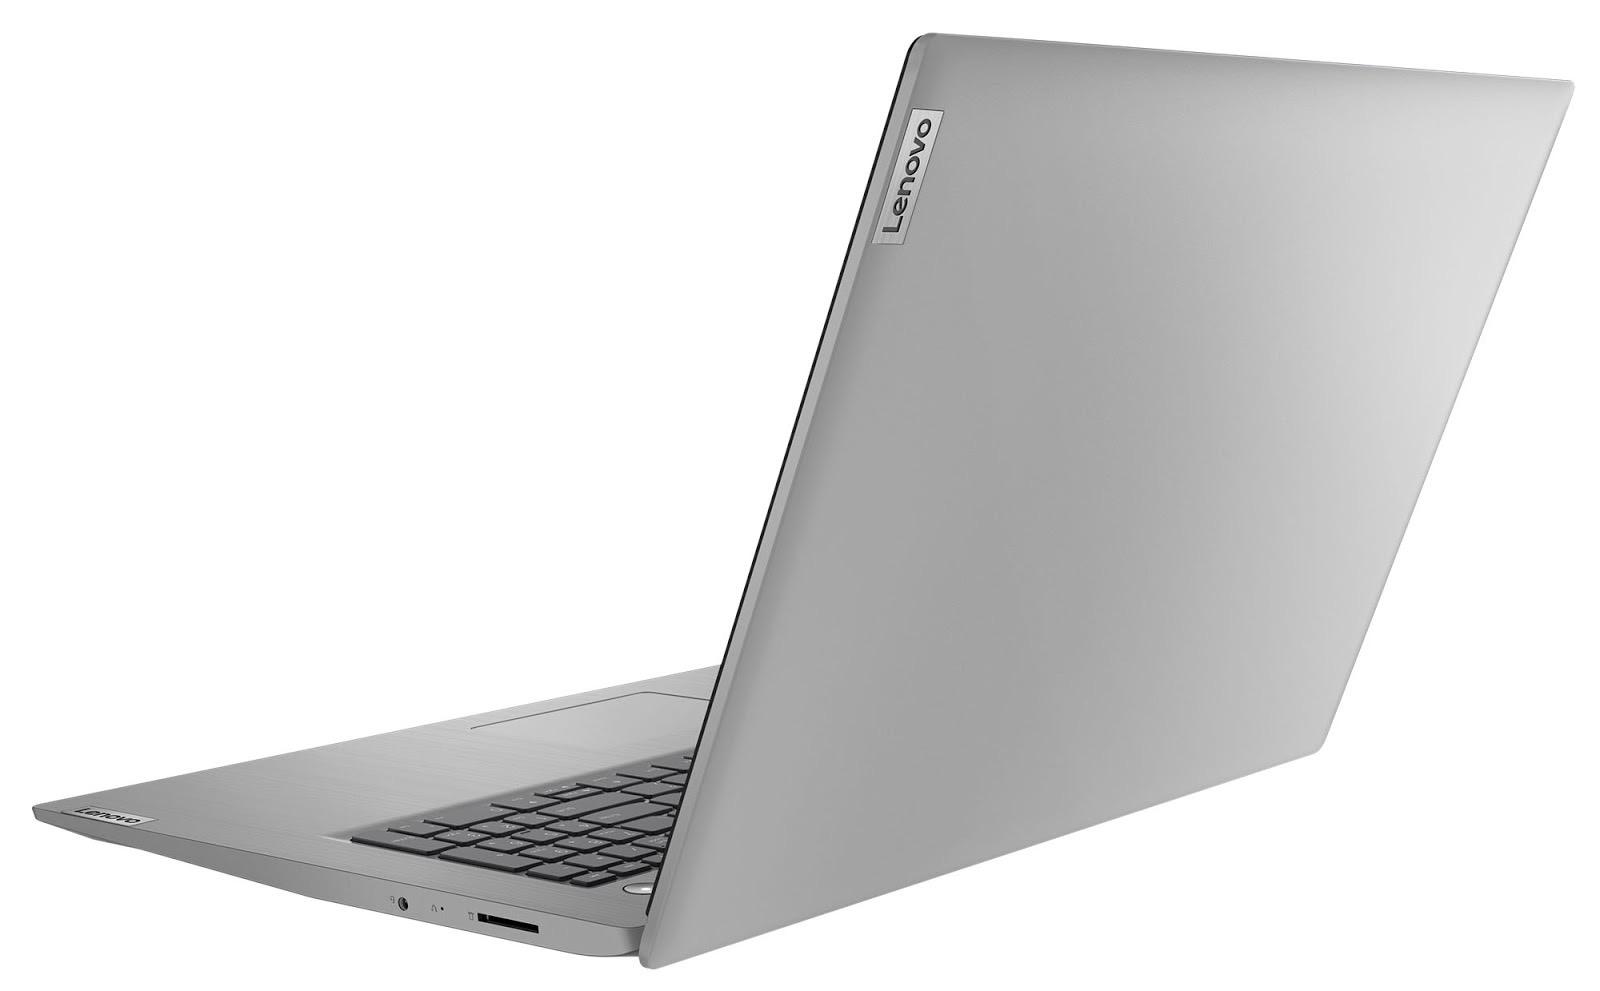 Фото 1. Ноутбук Lenovo ideapad 3 15IML05 Platinum Grey (81WB00LXRE)